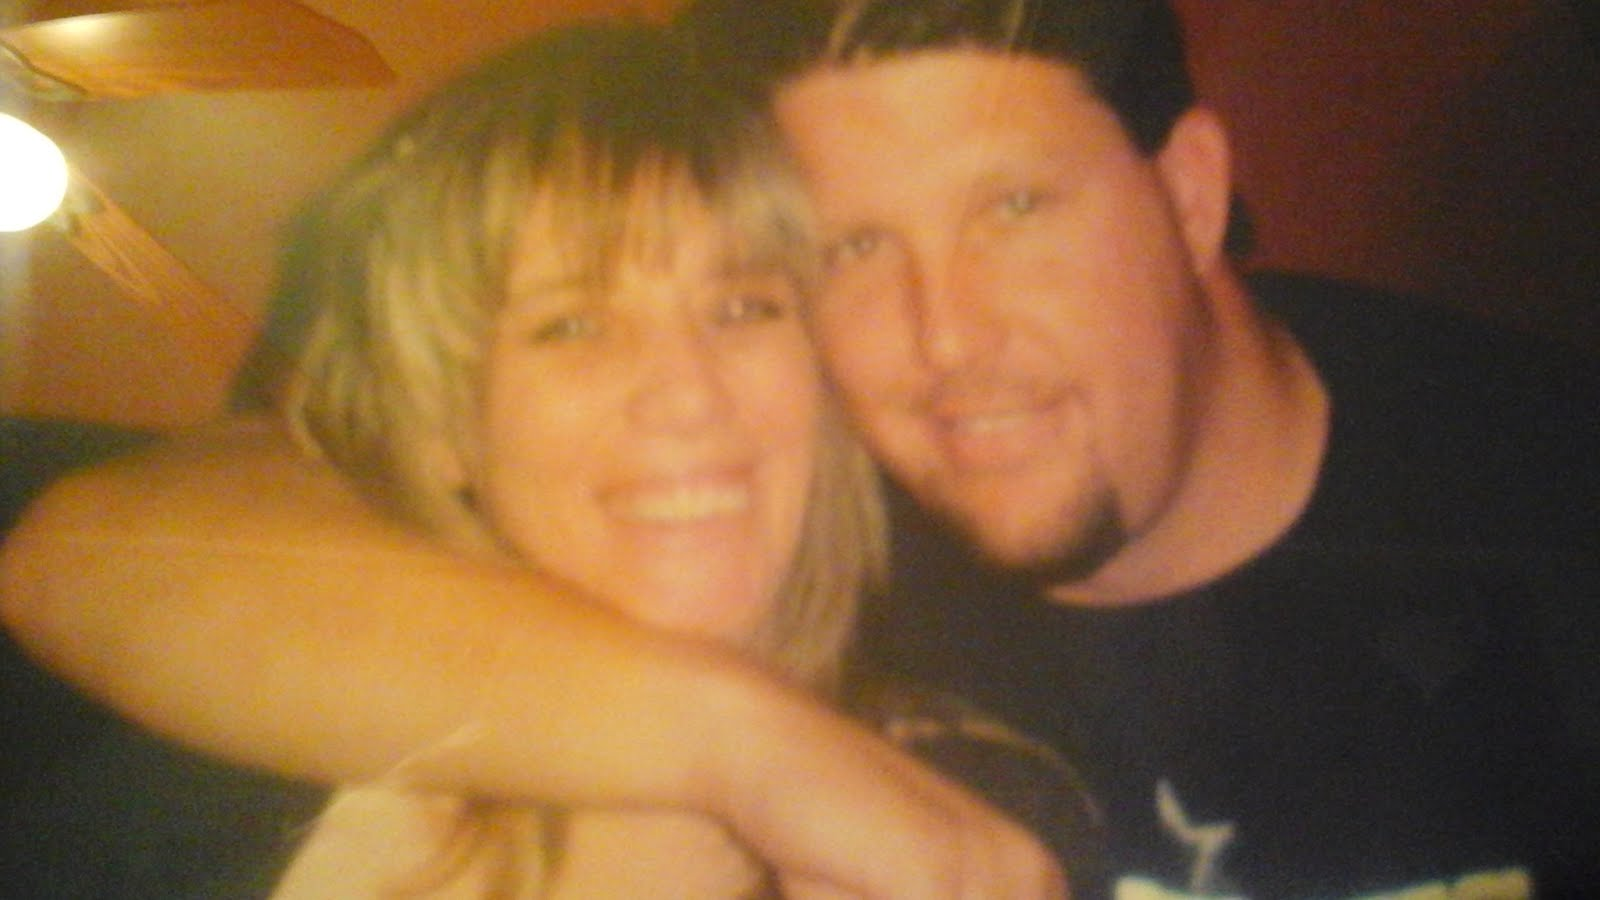 Phyllis And Shane Admins